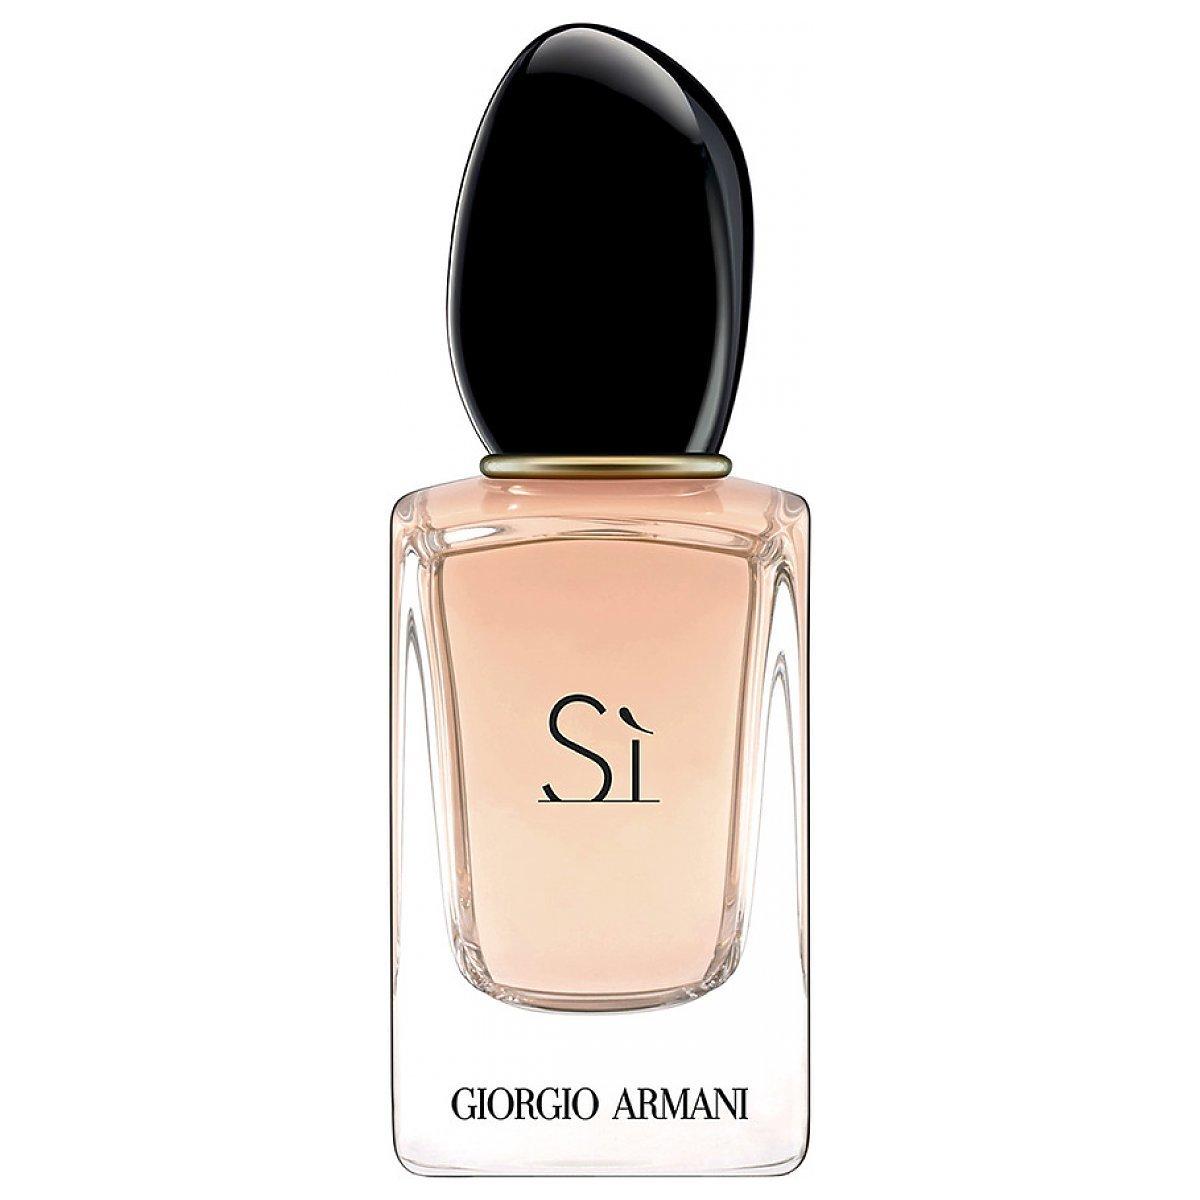 Giorgio Armani Si Woda perfumowana spray 30ml - Perfumeria ...